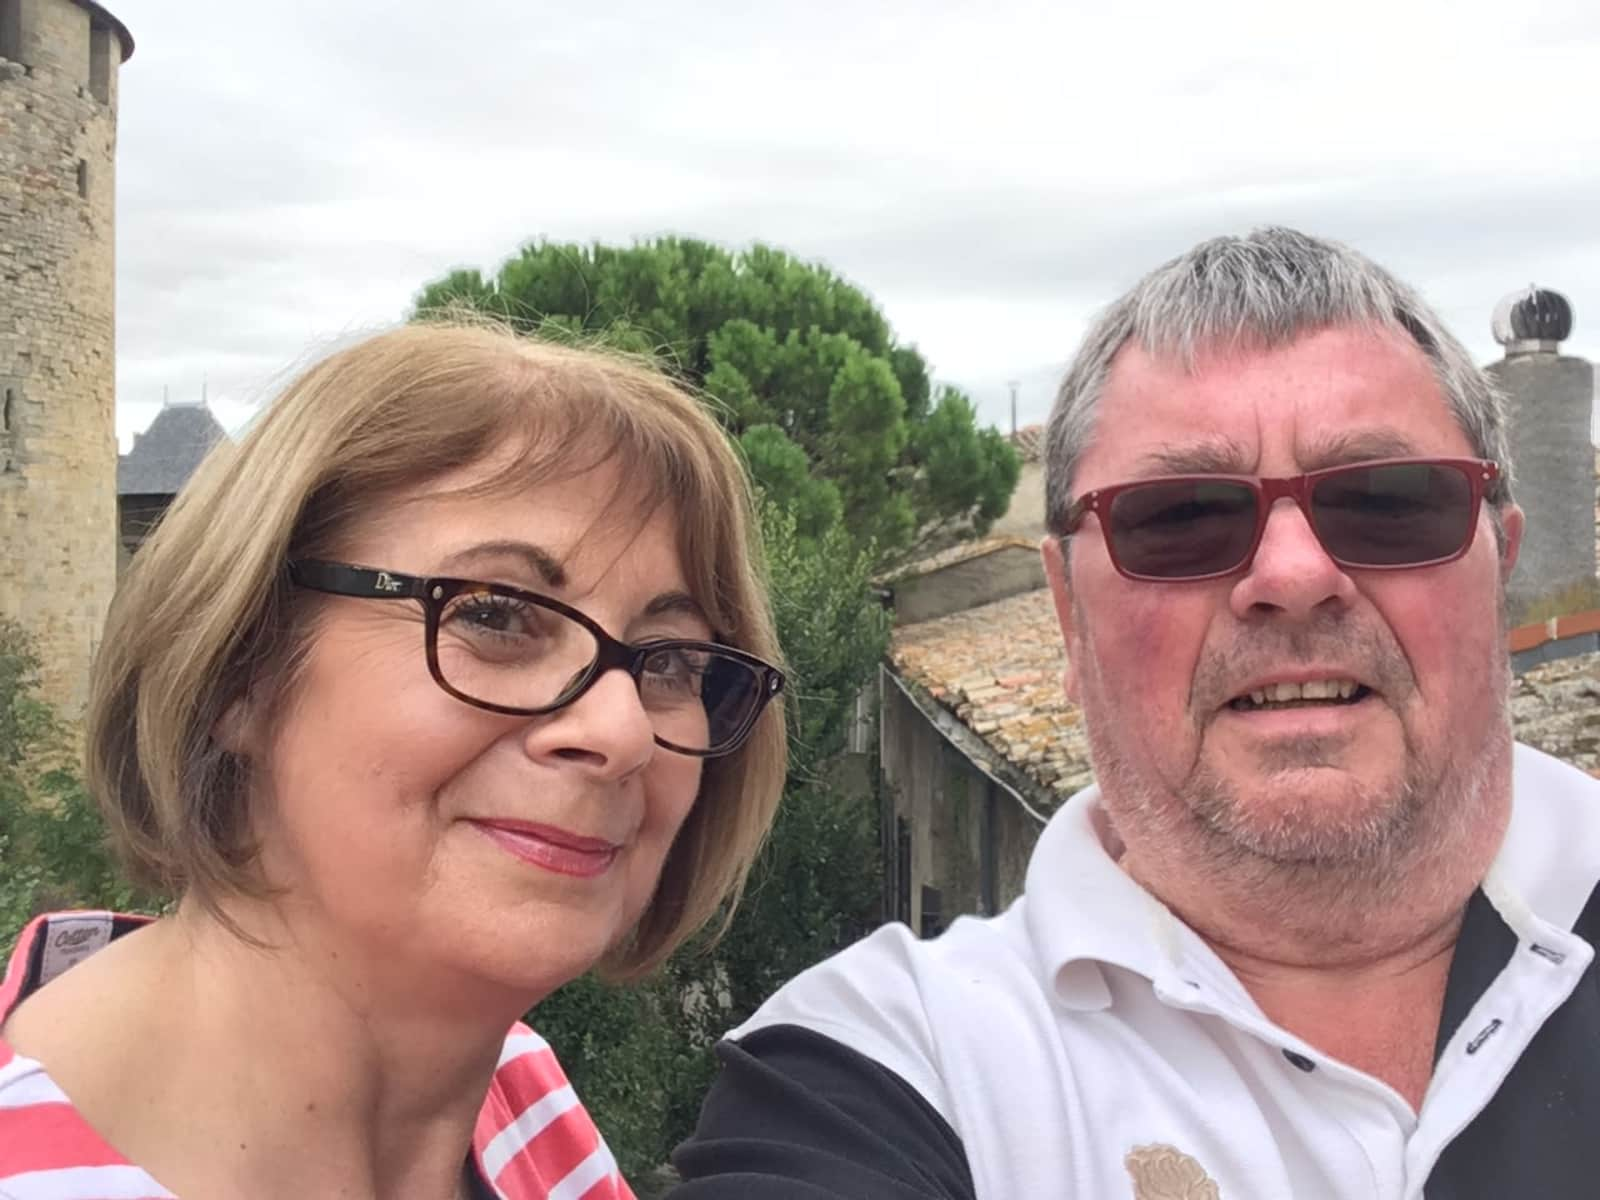 Paul & Barbara from Bagnoles-de-l'Orne, France